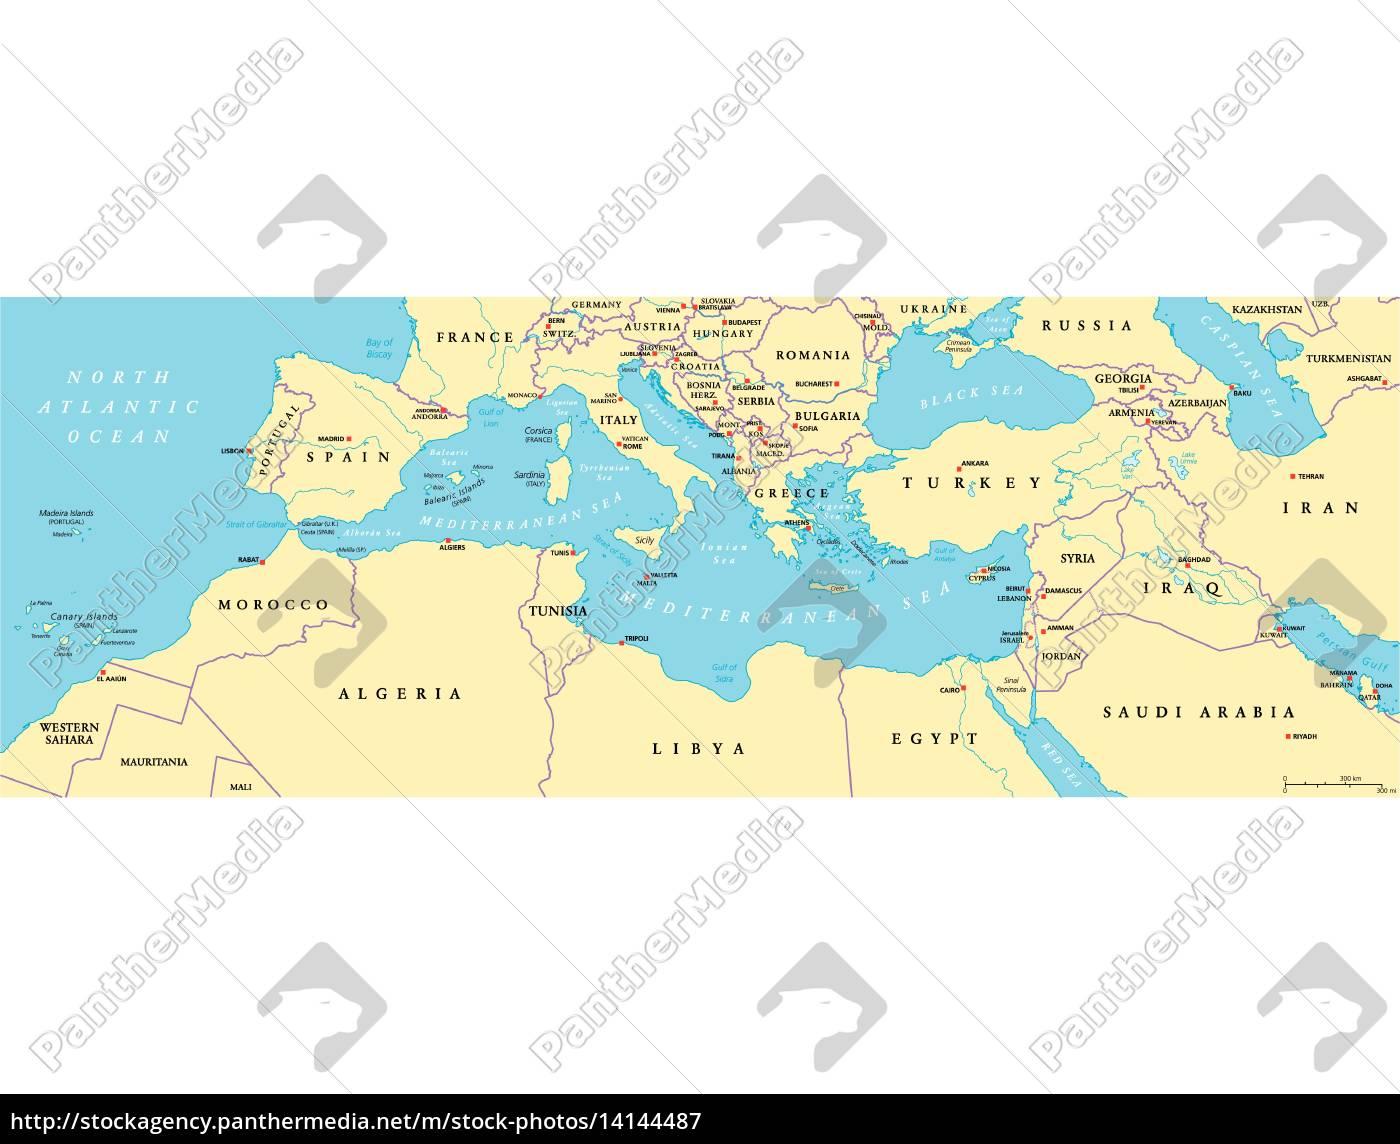 Mittelmeer Karte.Lizenzfreie Vektorgrafik 14144487 Mittelmeerraum Politische Karte